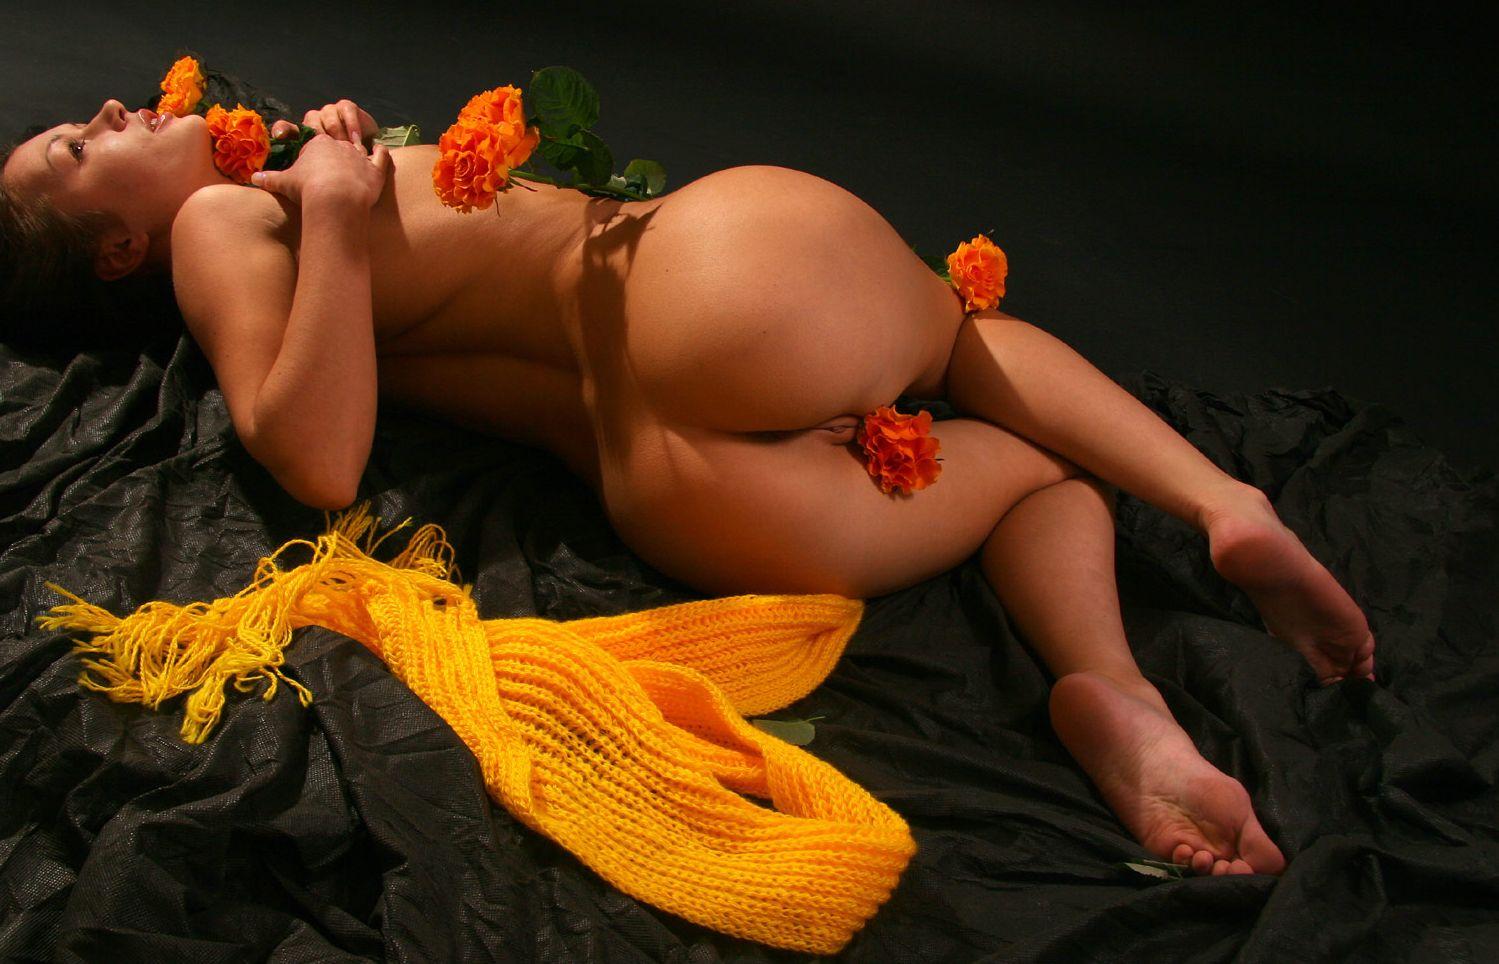 Erotic flowers pictures 9